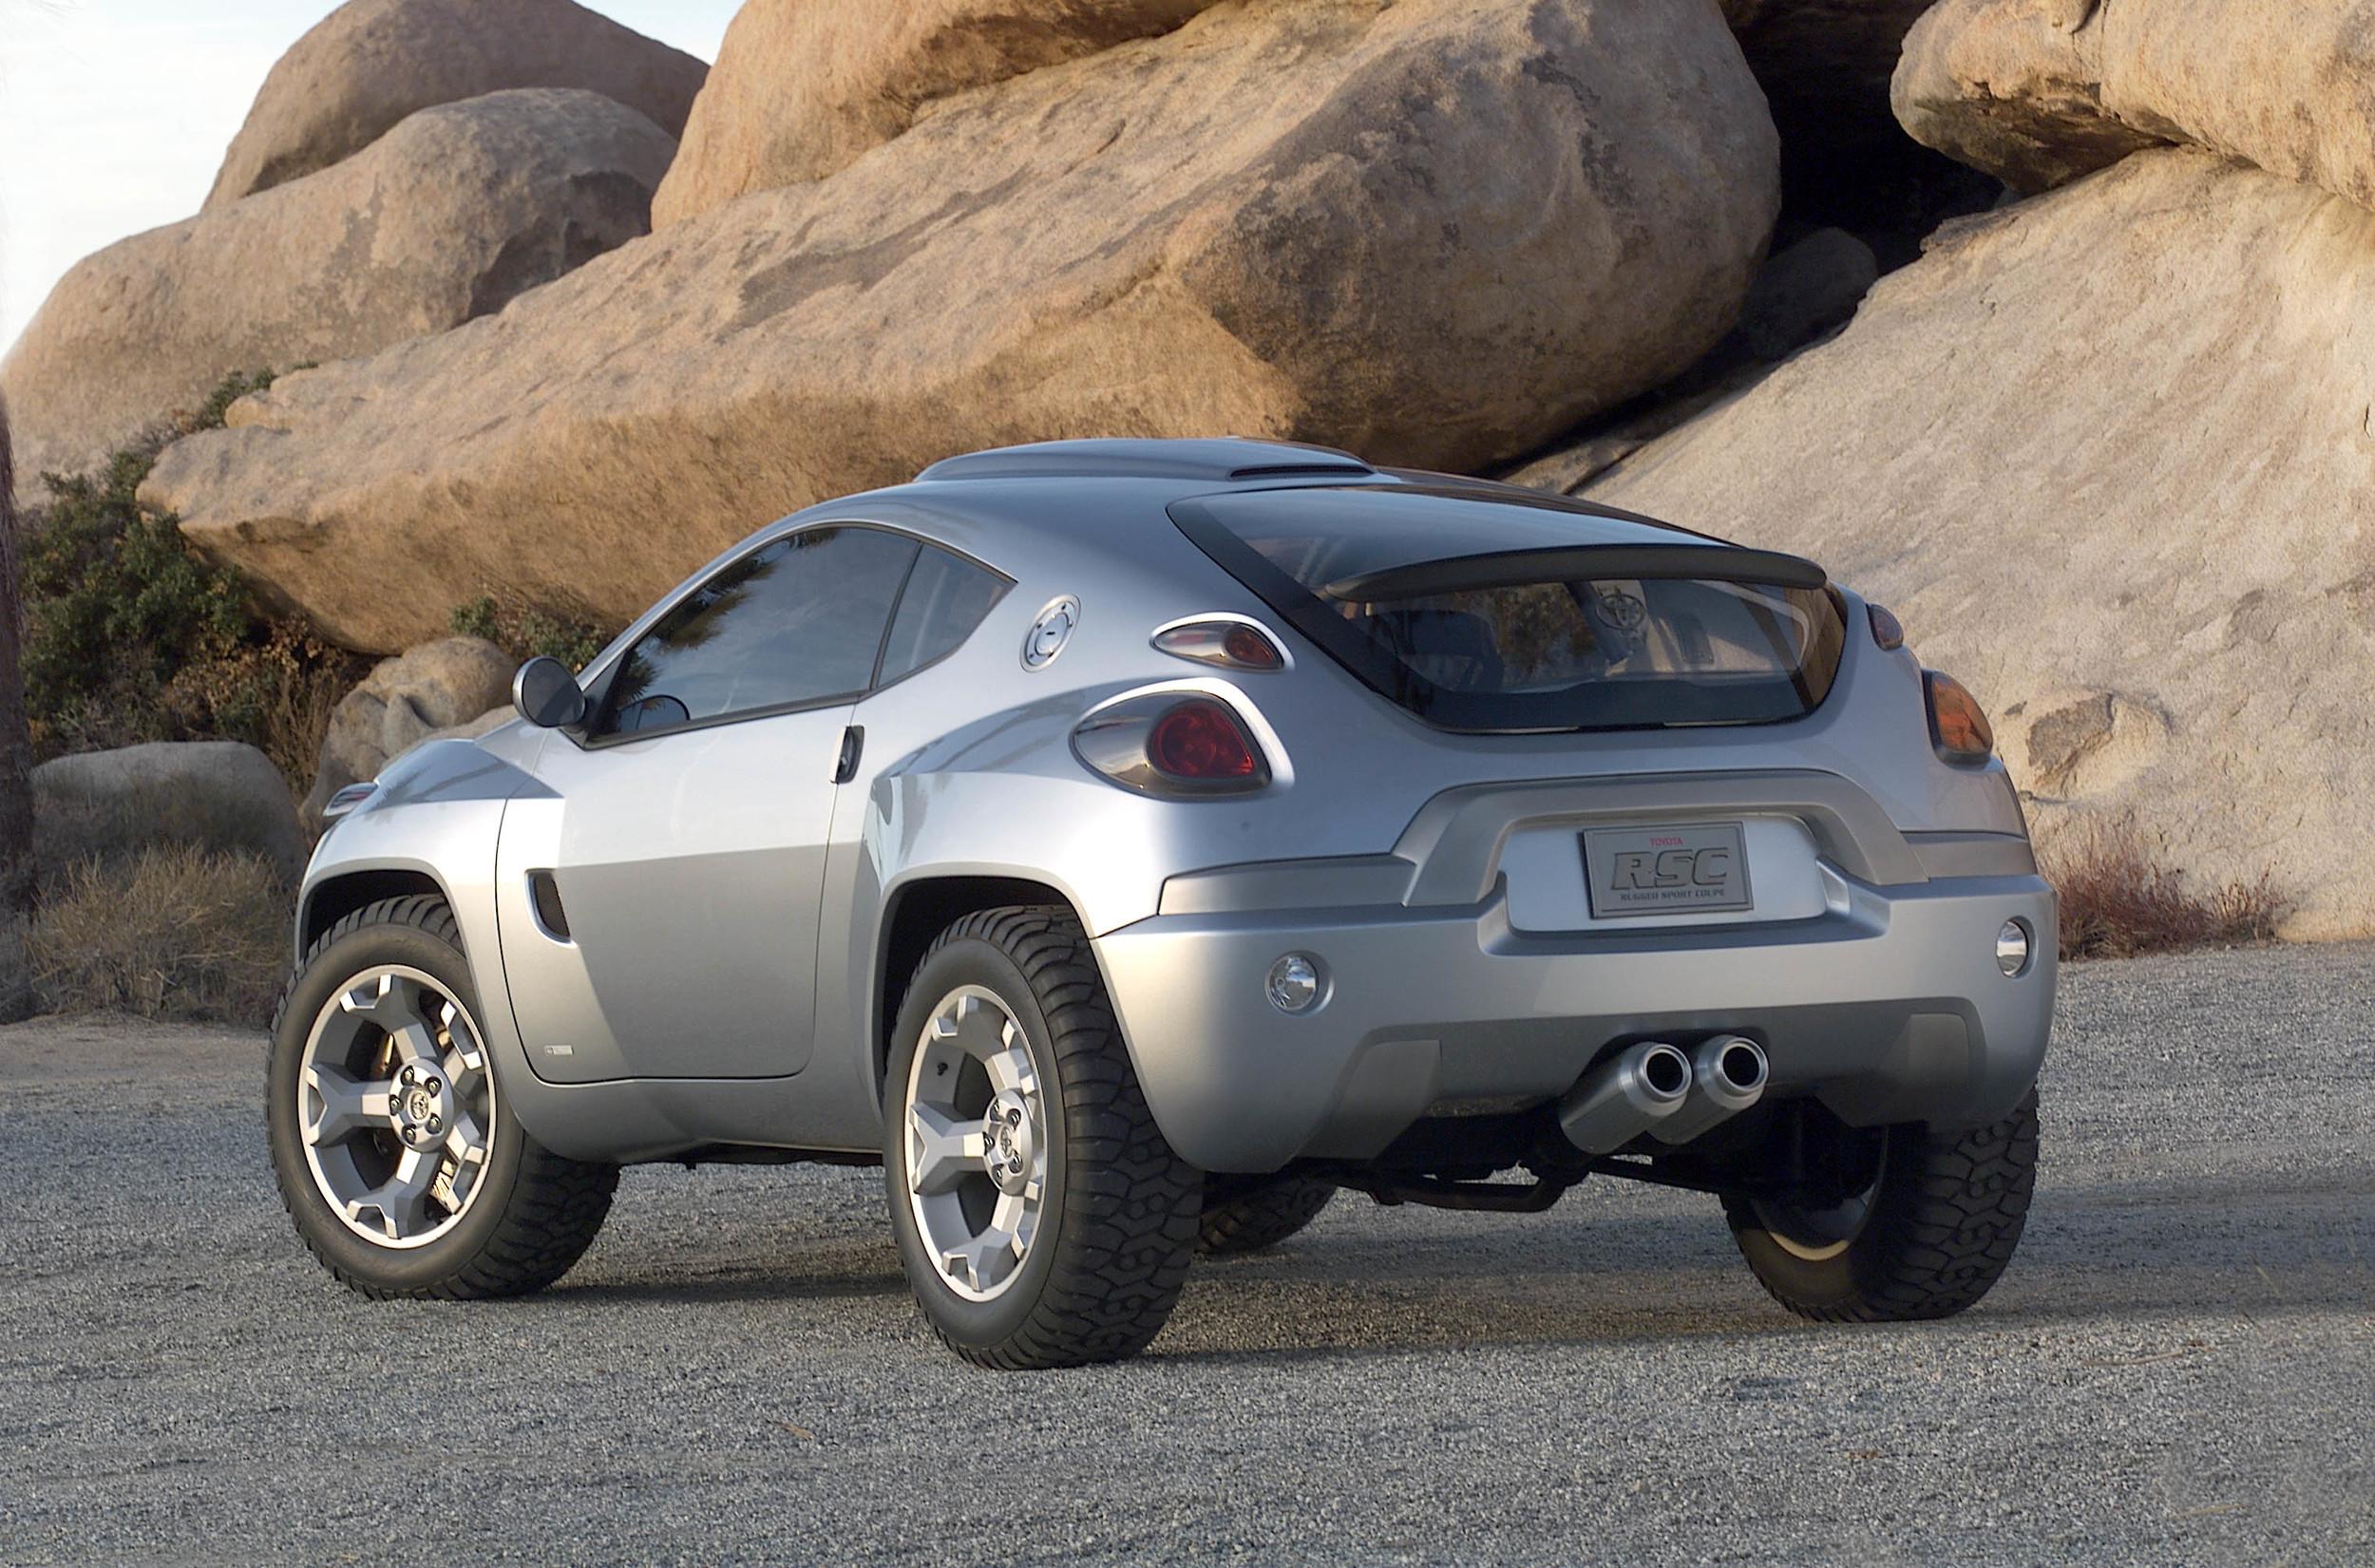 2001_Toyota_RSC_Concept_02.jpg